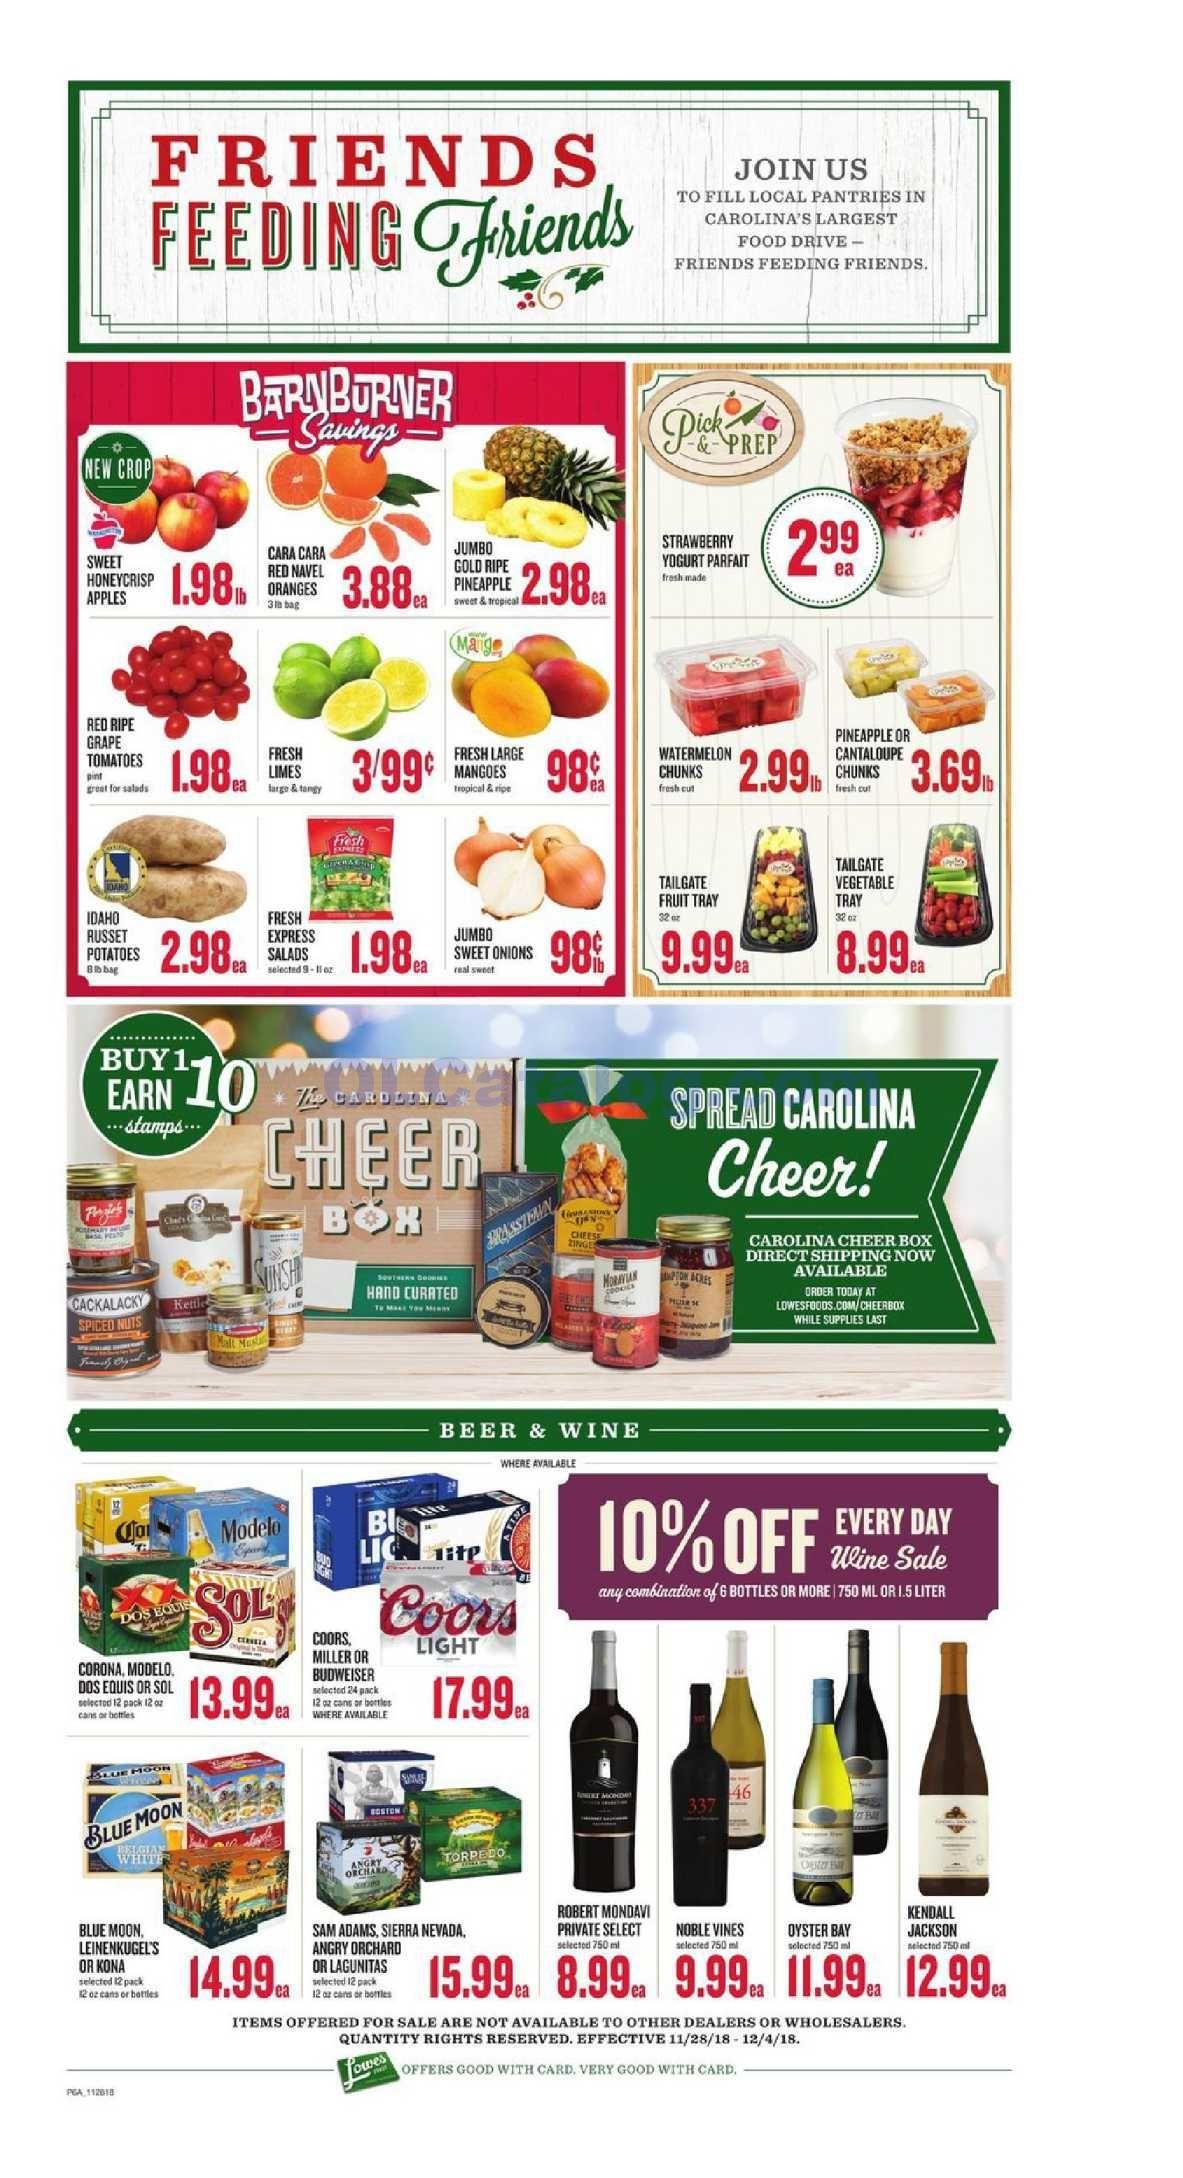 Lowes foods Weekly Ad November 28 December 4, 2018. View